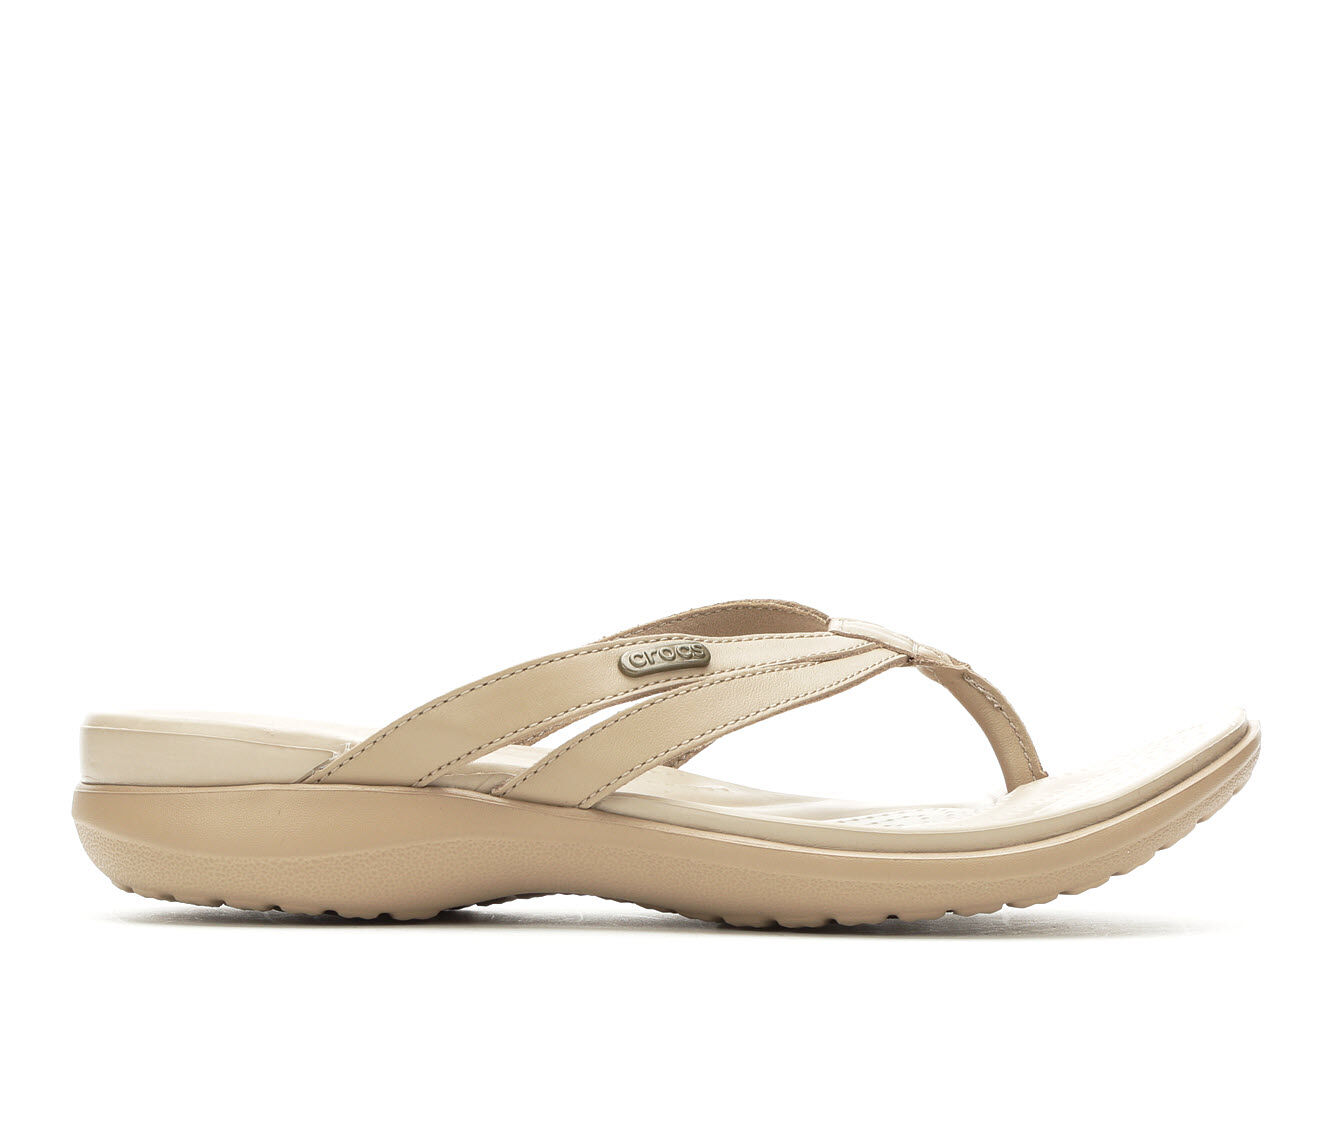 uk shoes_kd6866